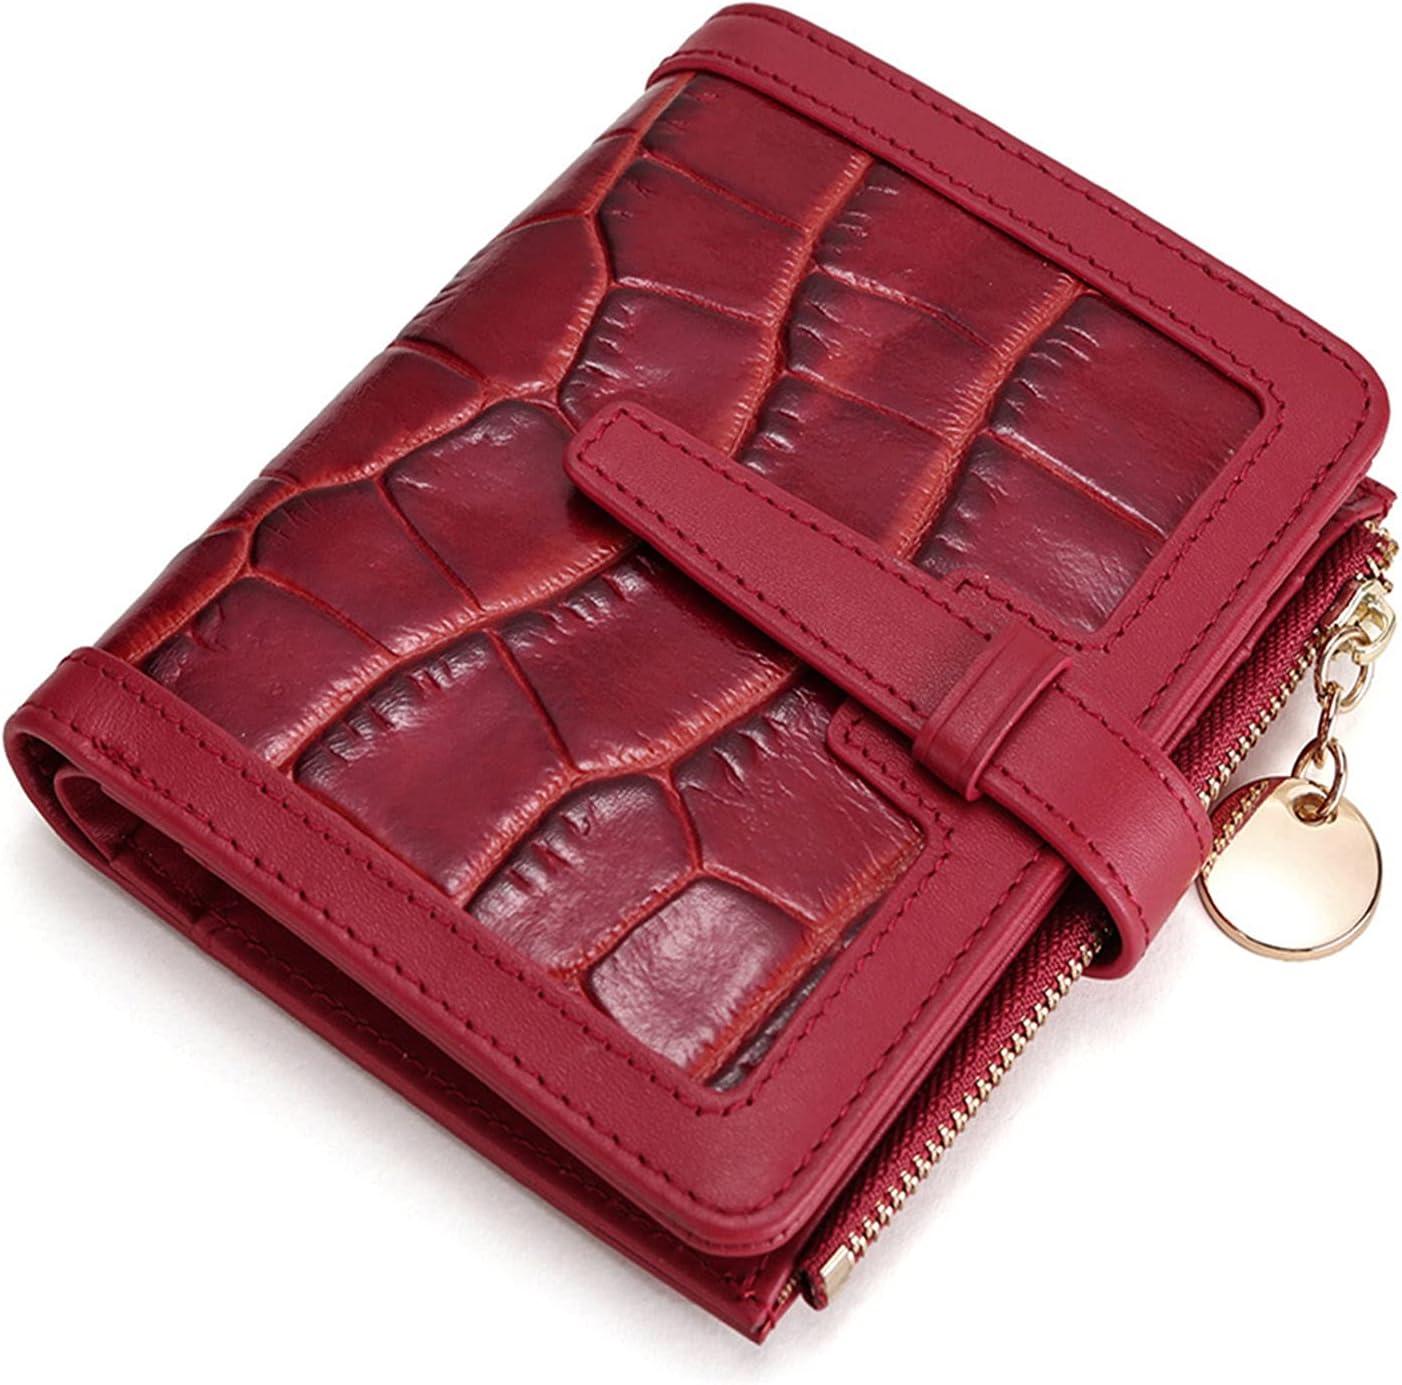 Women's Leather Wallet Boston Mall RFID Mini Blocking with Bombing new work ID